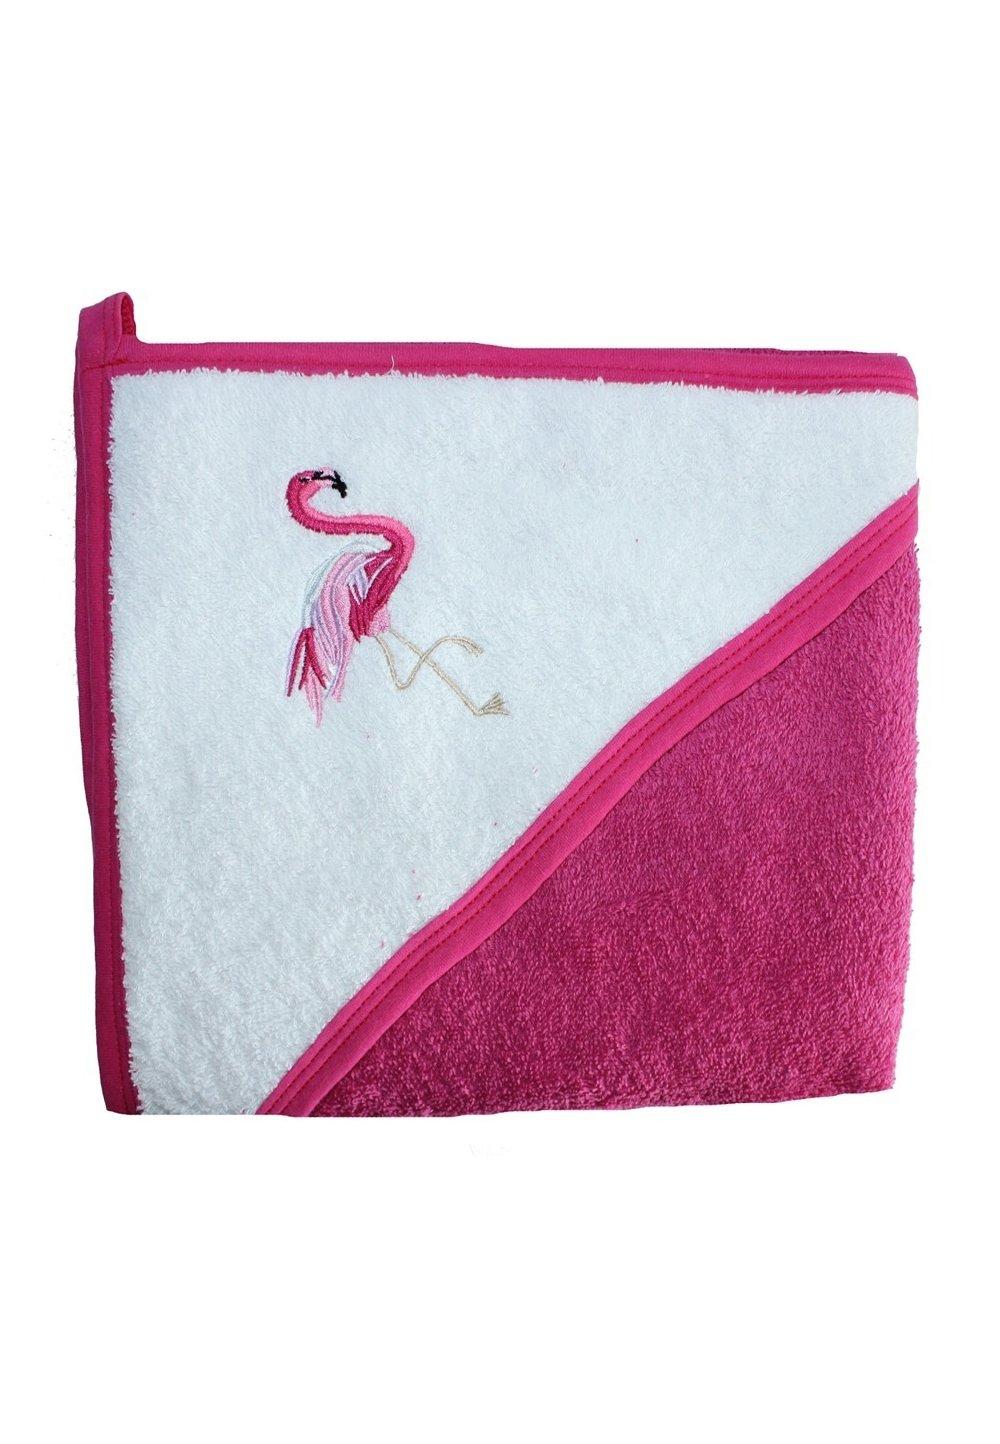 Prosop bumbac, roz inchis, flamingo, 80 x 100 cm imagine